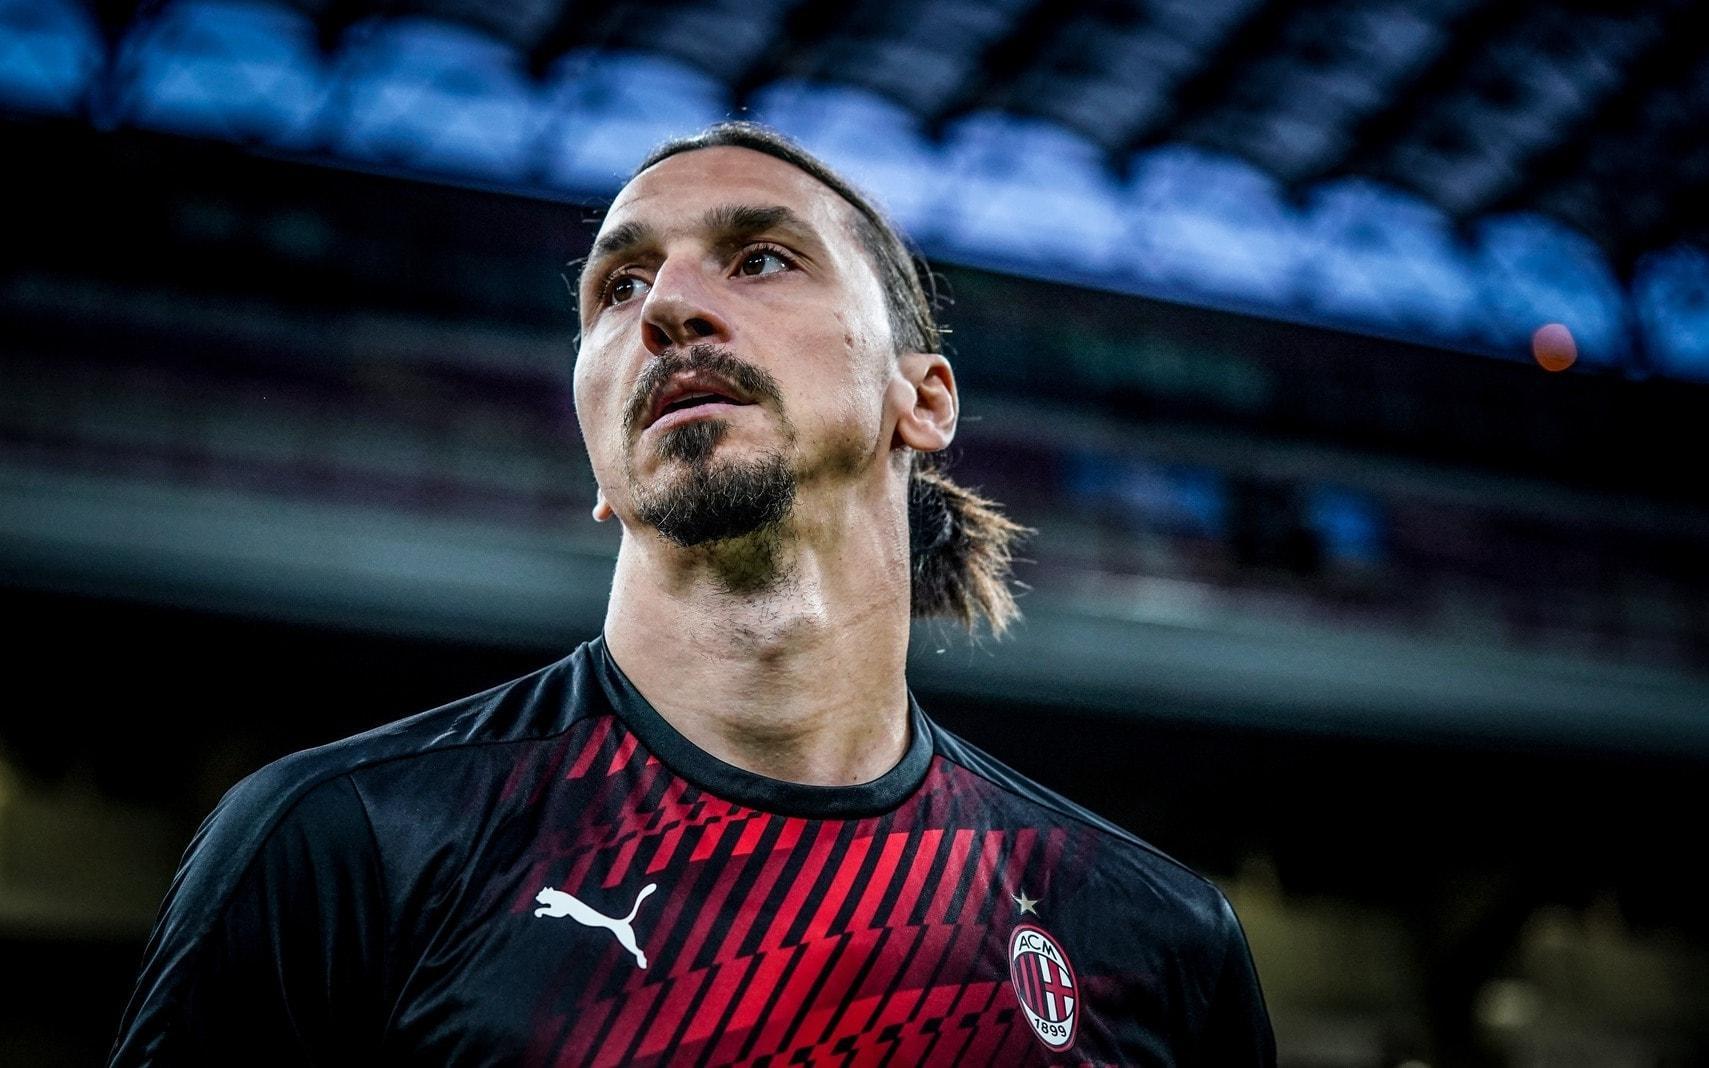 Zlatan Ibrahimovic AC Mailand 2